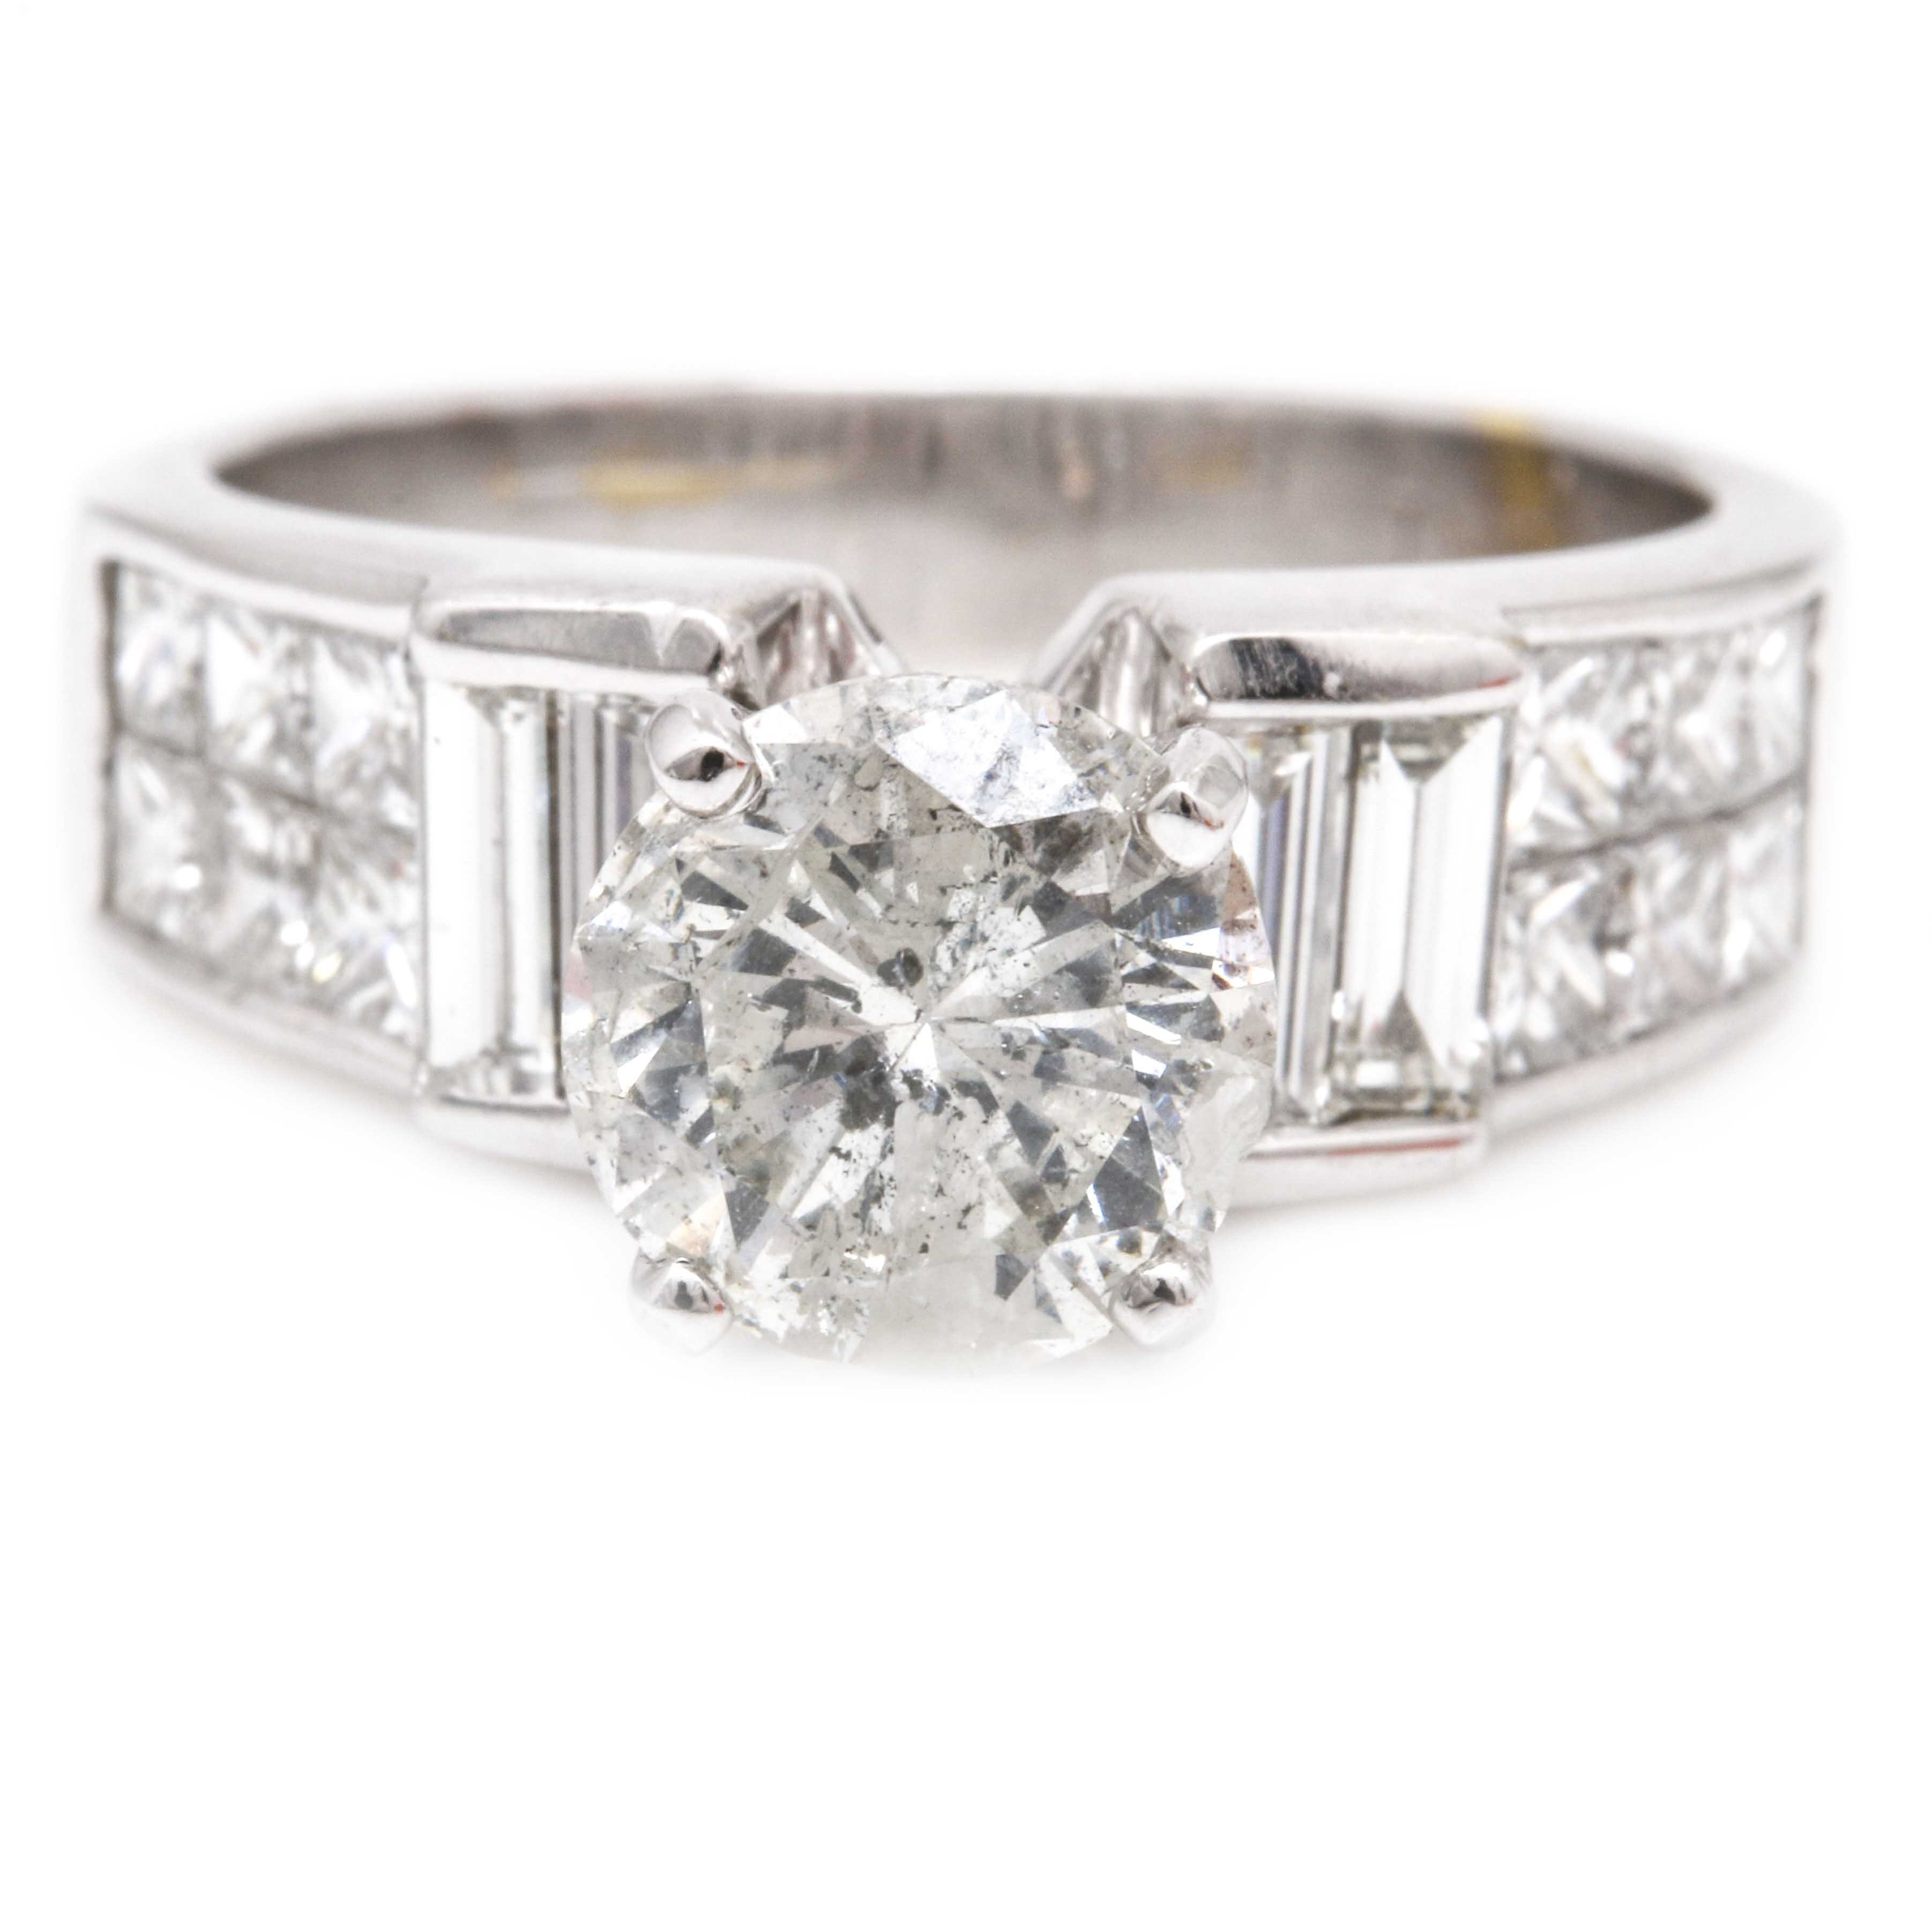 3.98 CTW 18K White Gold Diamond Ring